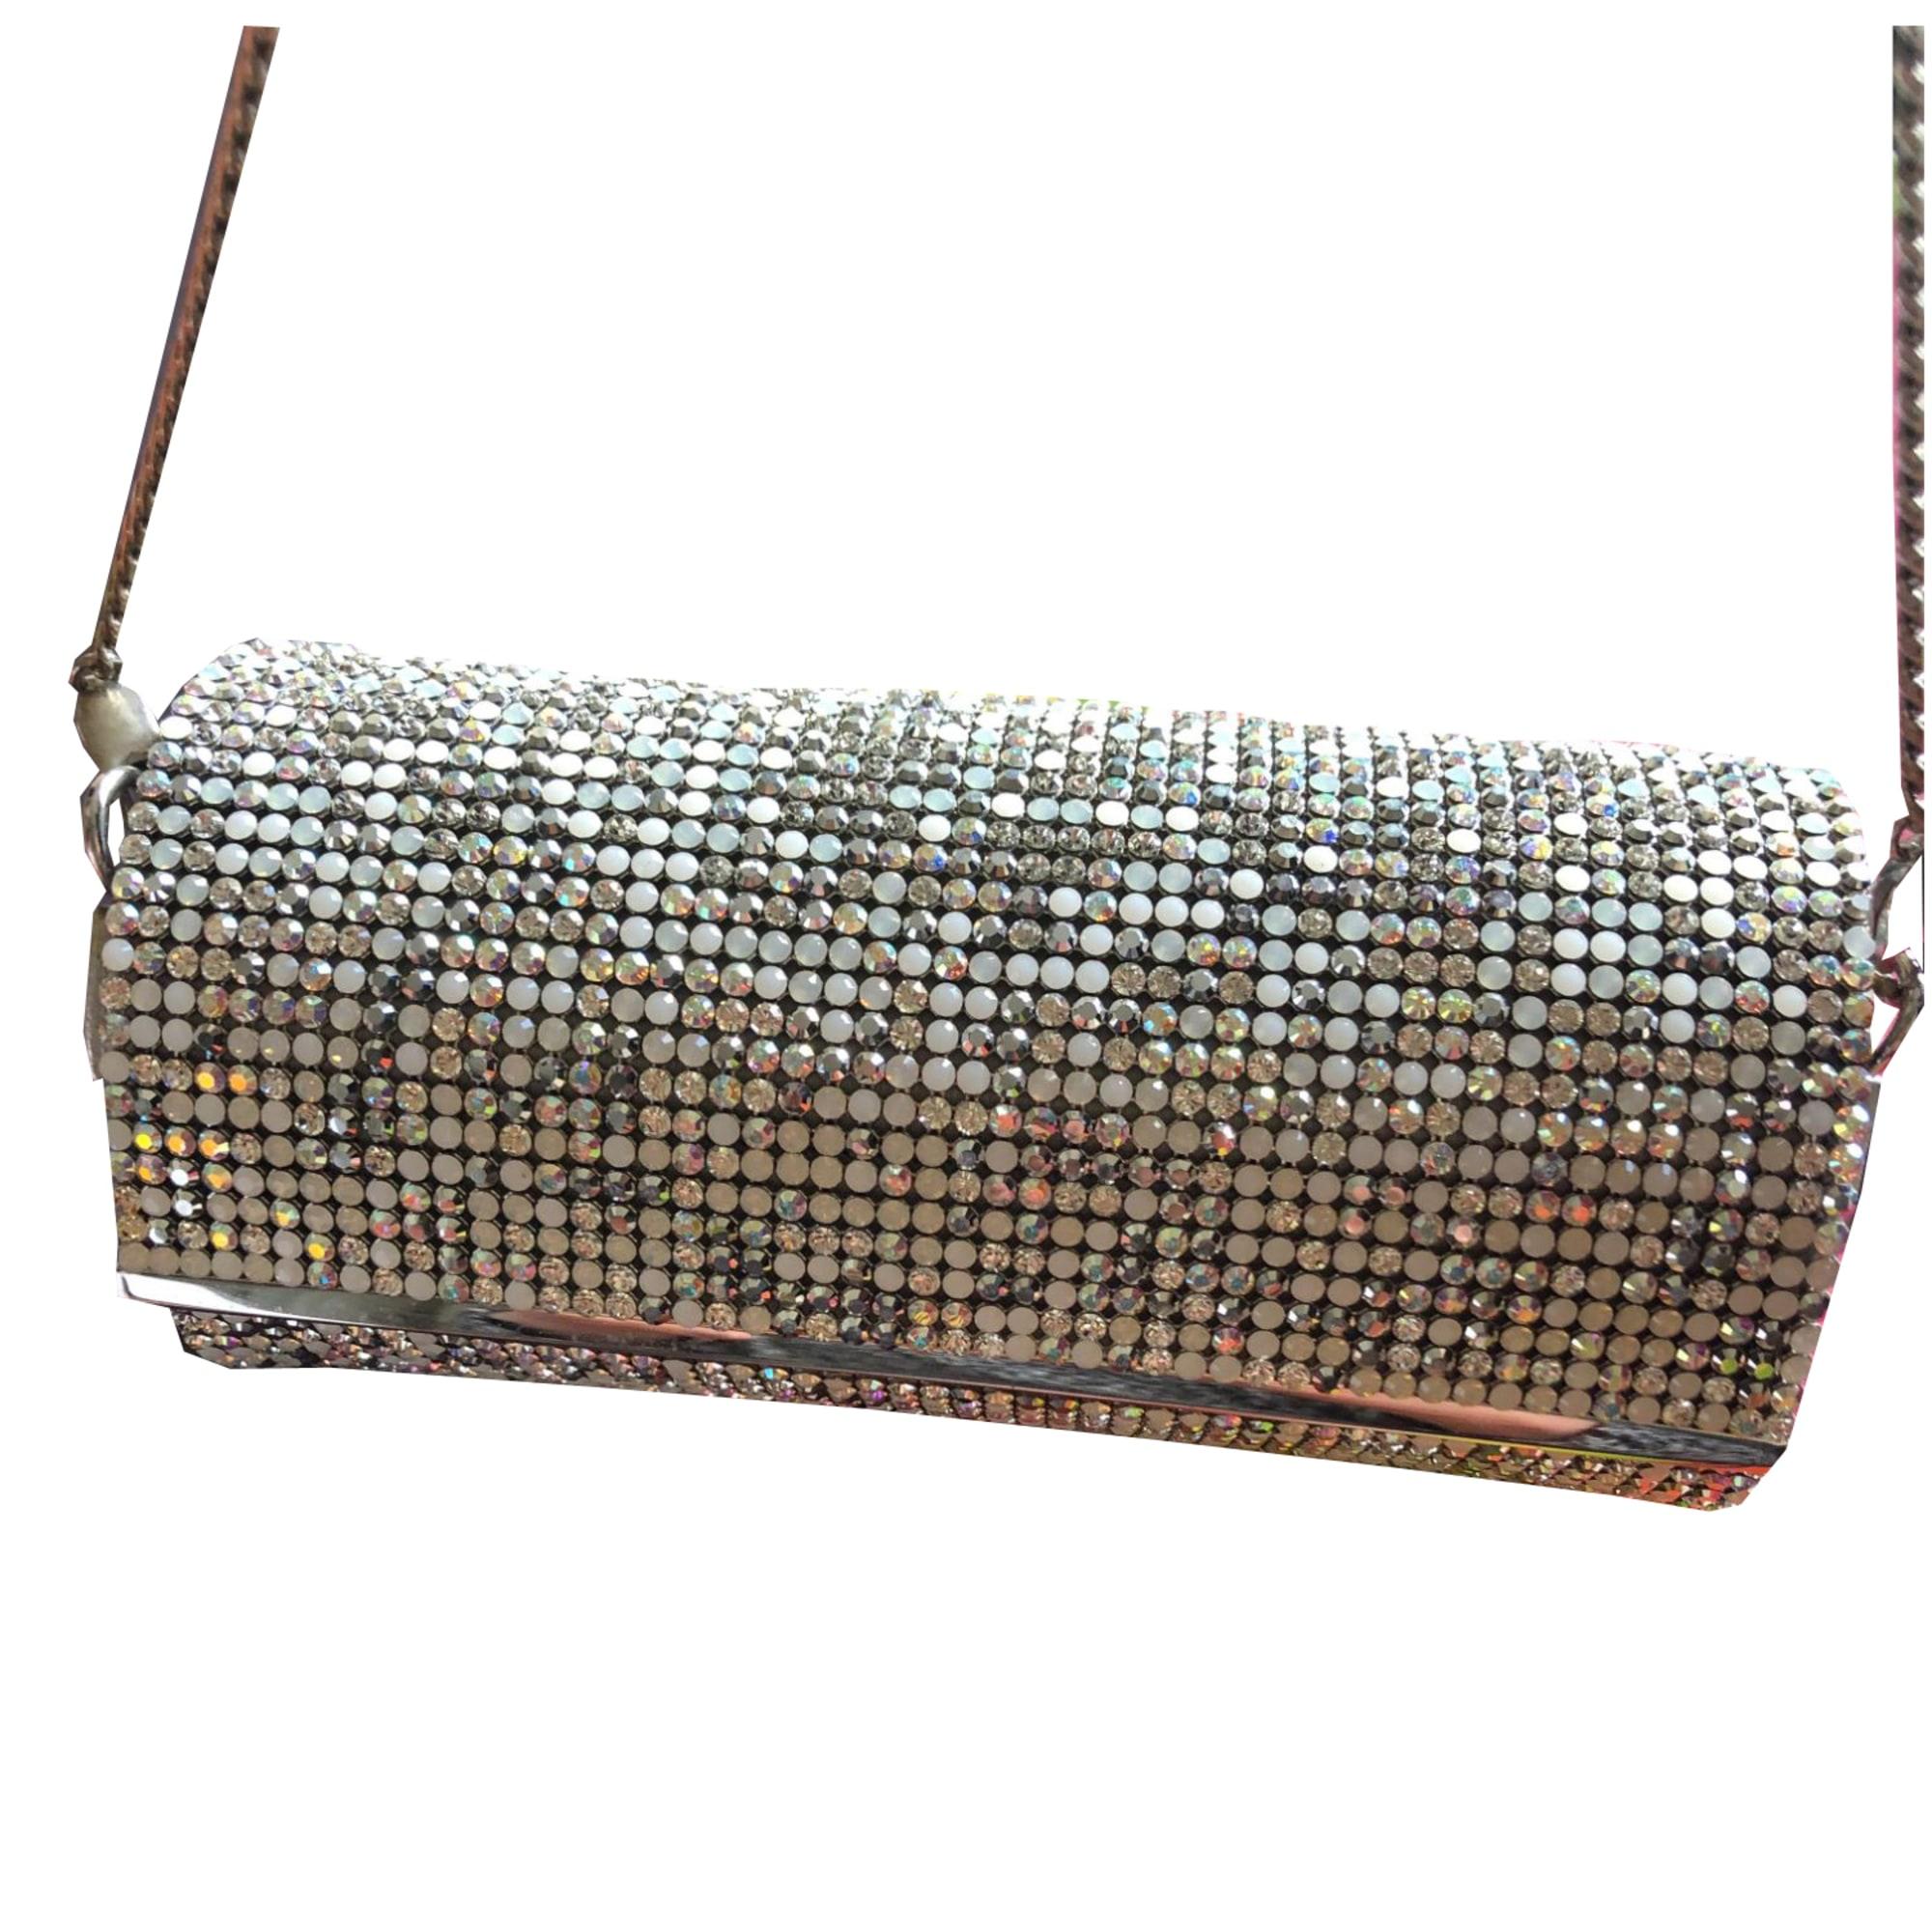 sac argenté swaroski longchamp